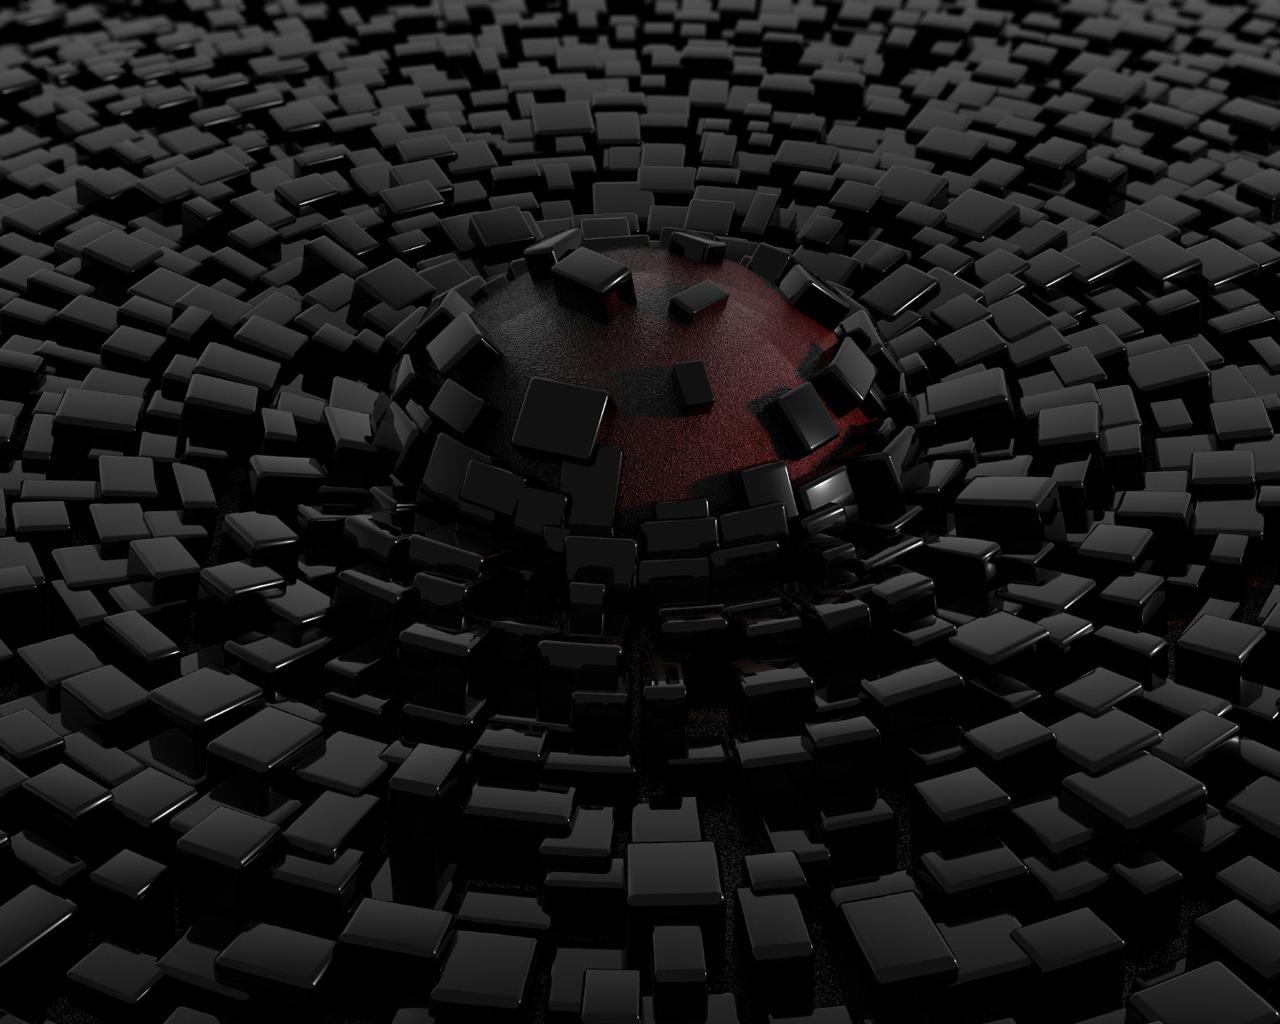 Free Download 3d Abstract Black Blocks Hd Wallpaper Hd Wallpapers